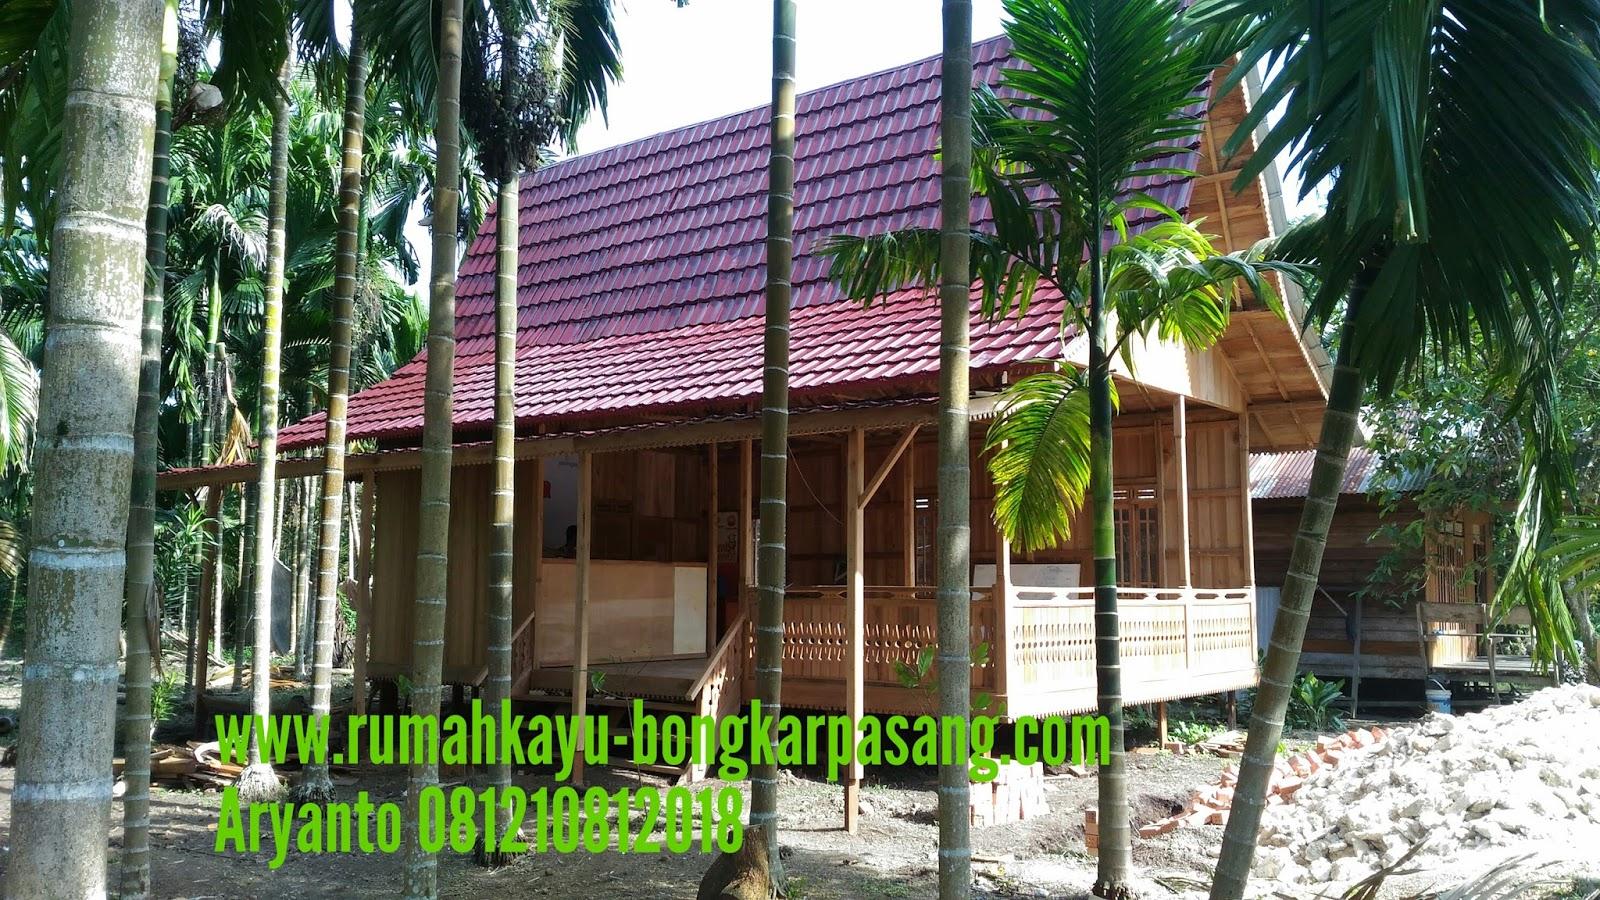 Desain Rumah Panggung Jambi Kayu Bongkar Pasang